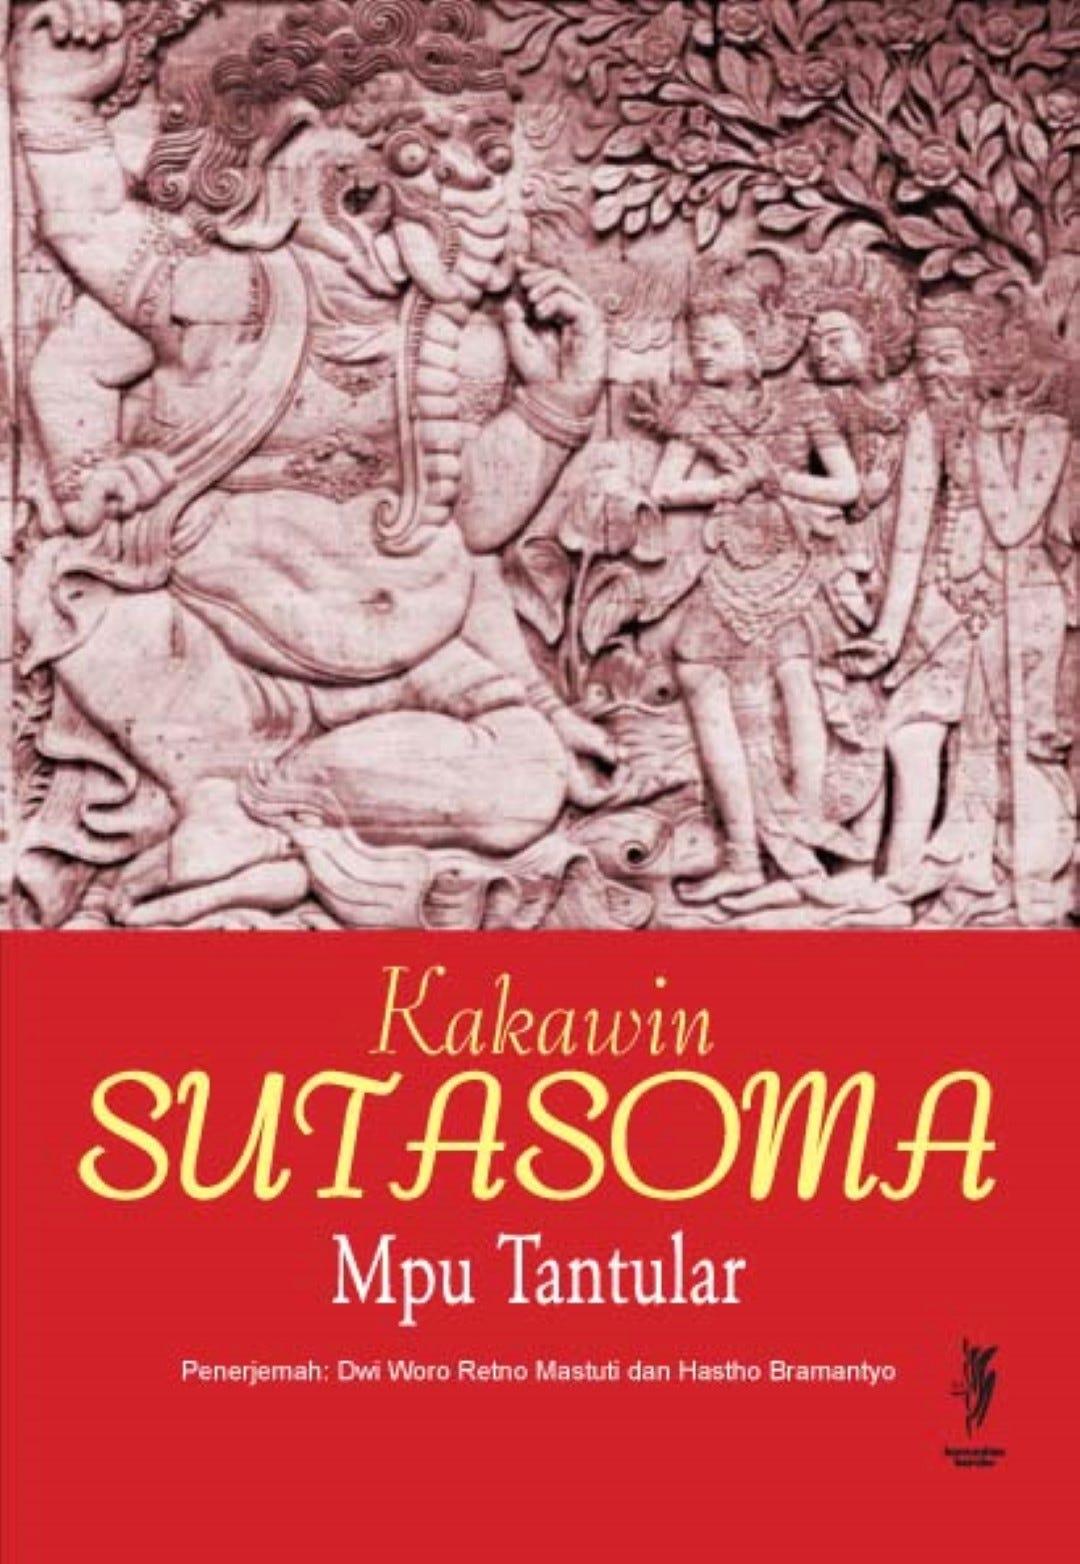 Arti Bhinneka Tunggal Ika Tan Hana Dharma Mangrwa : bhinneka, tunggal, dharma, mangrwa, BHINNEKA, TUNGGAL, Muhammada, Ma'elbaqar, Medium